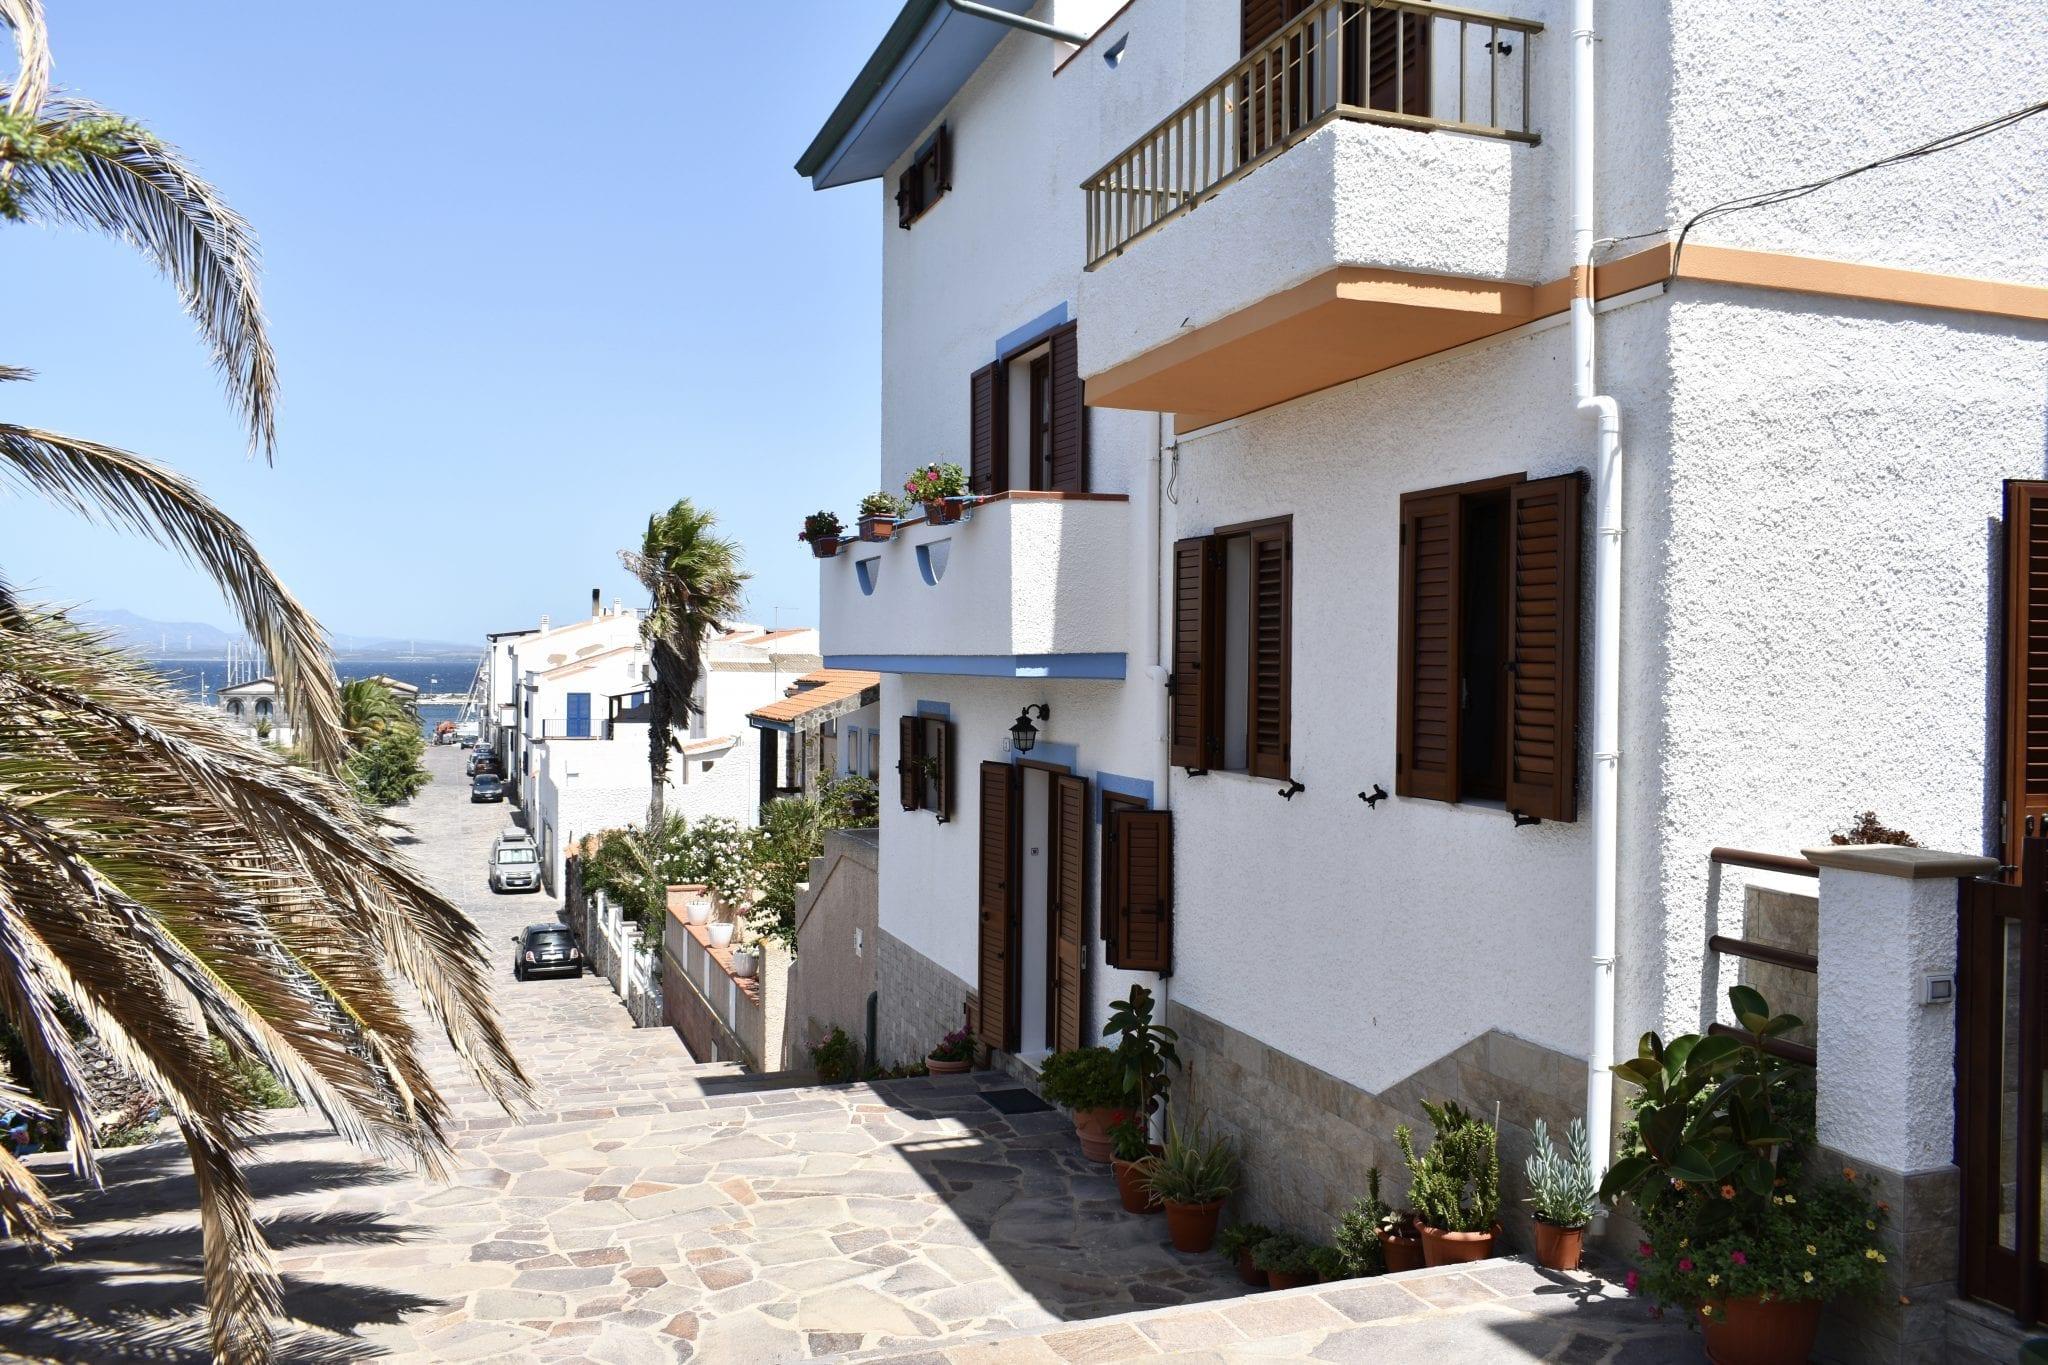 Calasetta - case fronte mare Le Plume